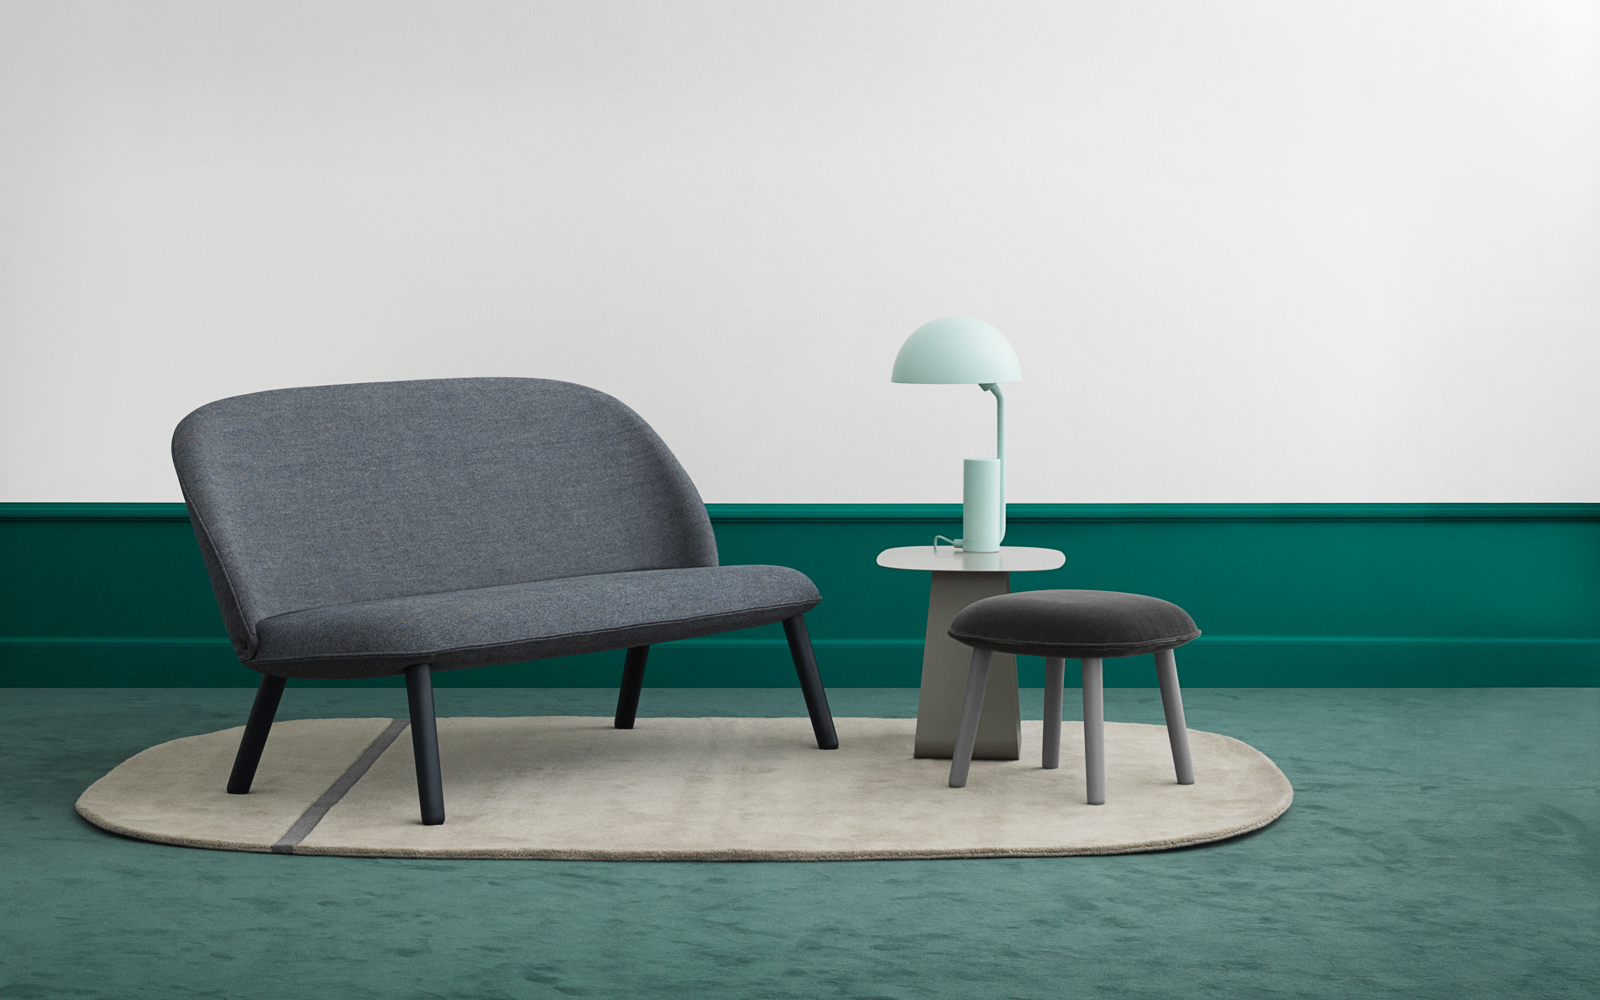 normann copenhagen ace sofa design hans homemann. Black Bedroom Furniture Sets. Home Design Ideas